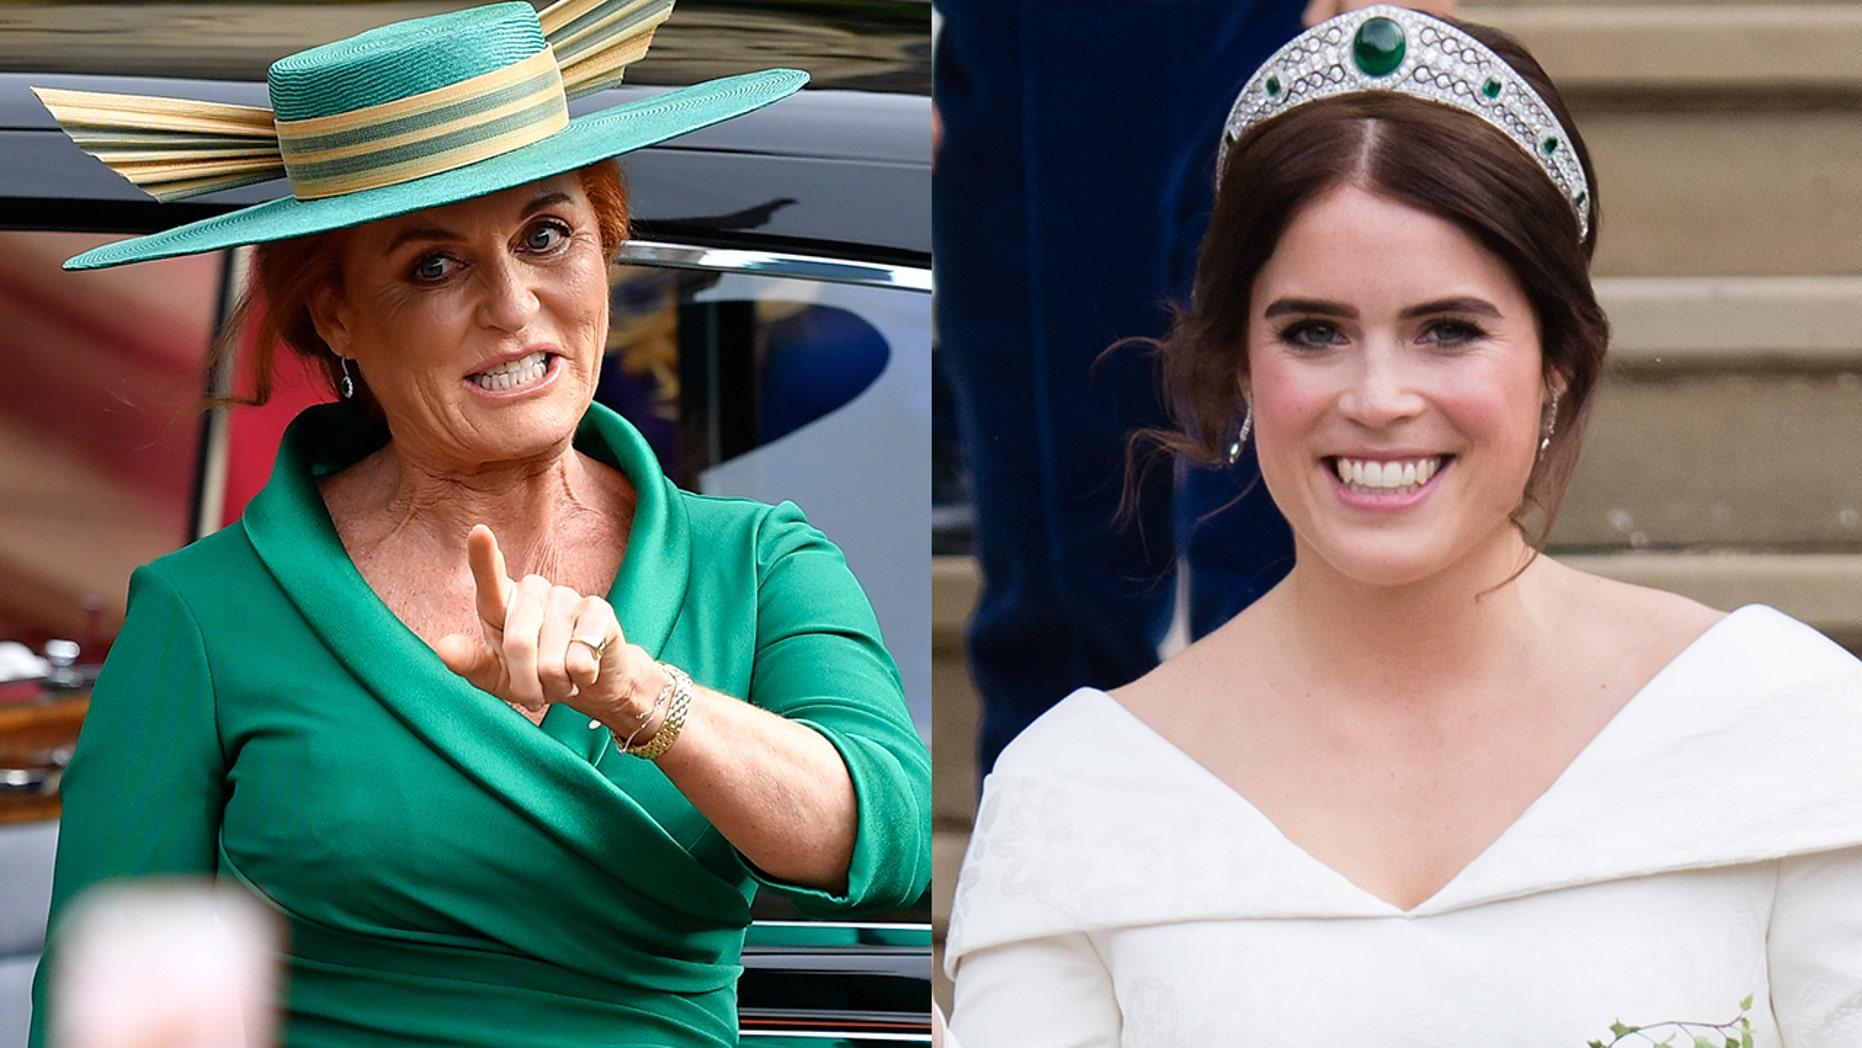 Sarah Ferguson commented on her daughter Princess Eugene's wedding.